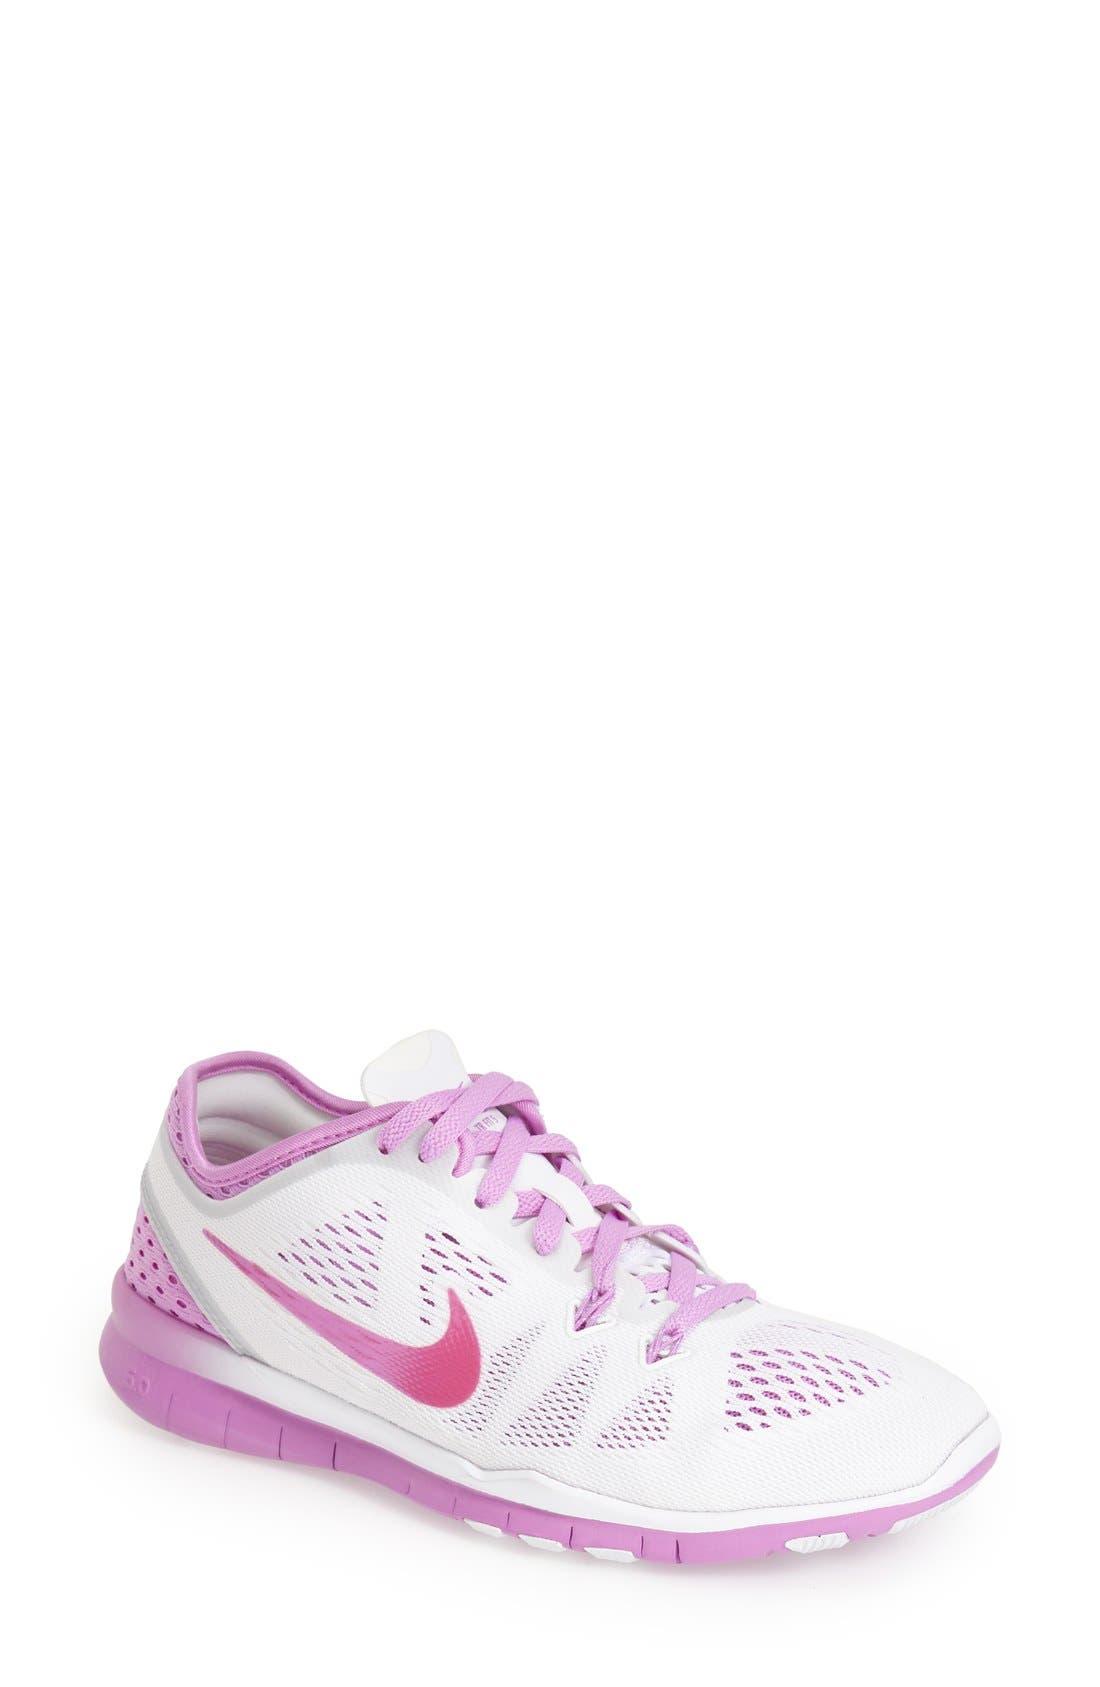 Main Image - Nike 'Free 5.0 TR Fit 5 Breathe' Training Shoe (Women)